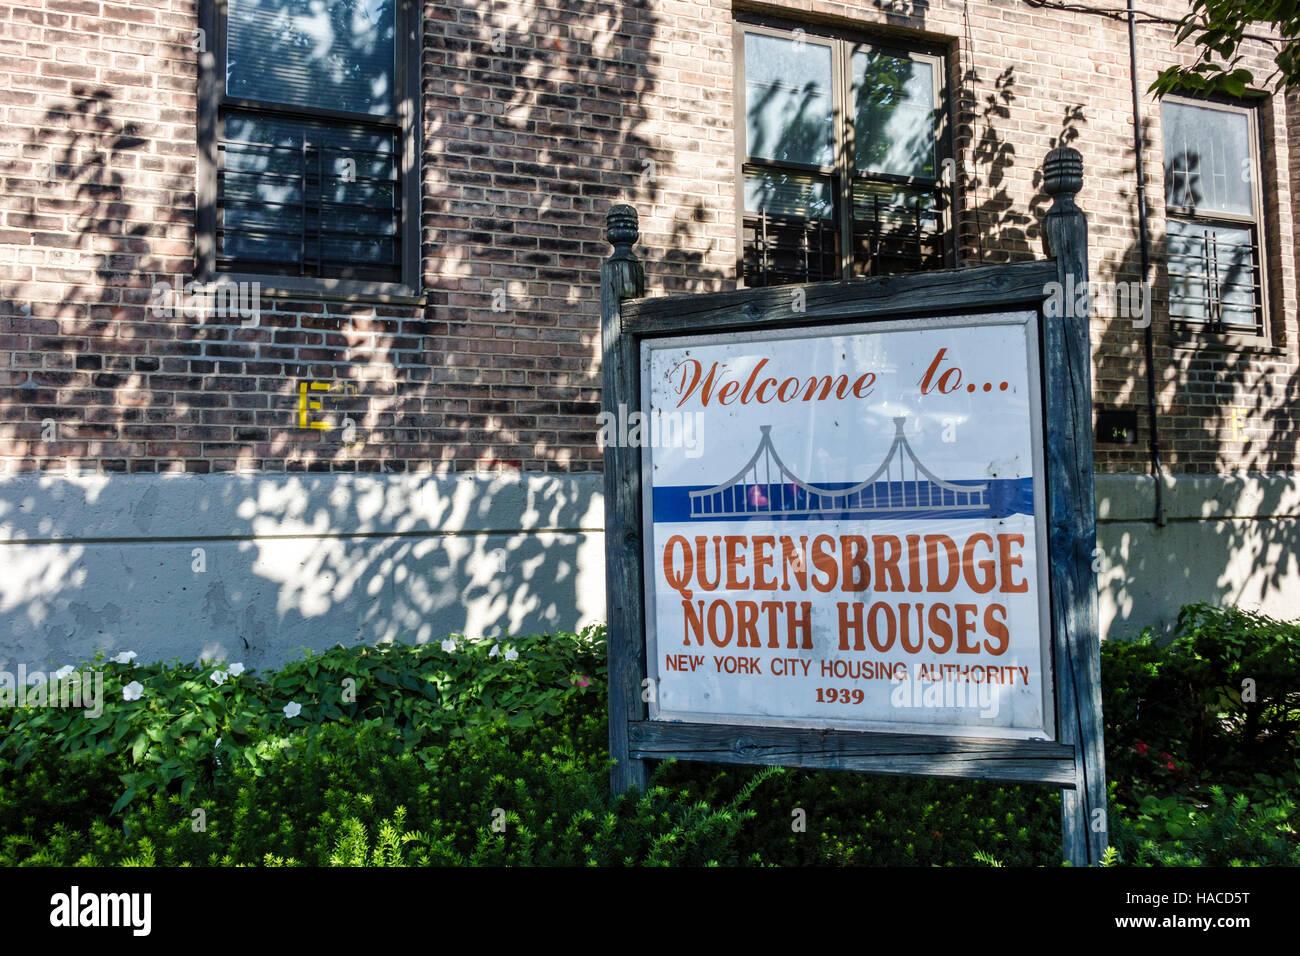 New York City Housing Authority Stock Photos & New York City